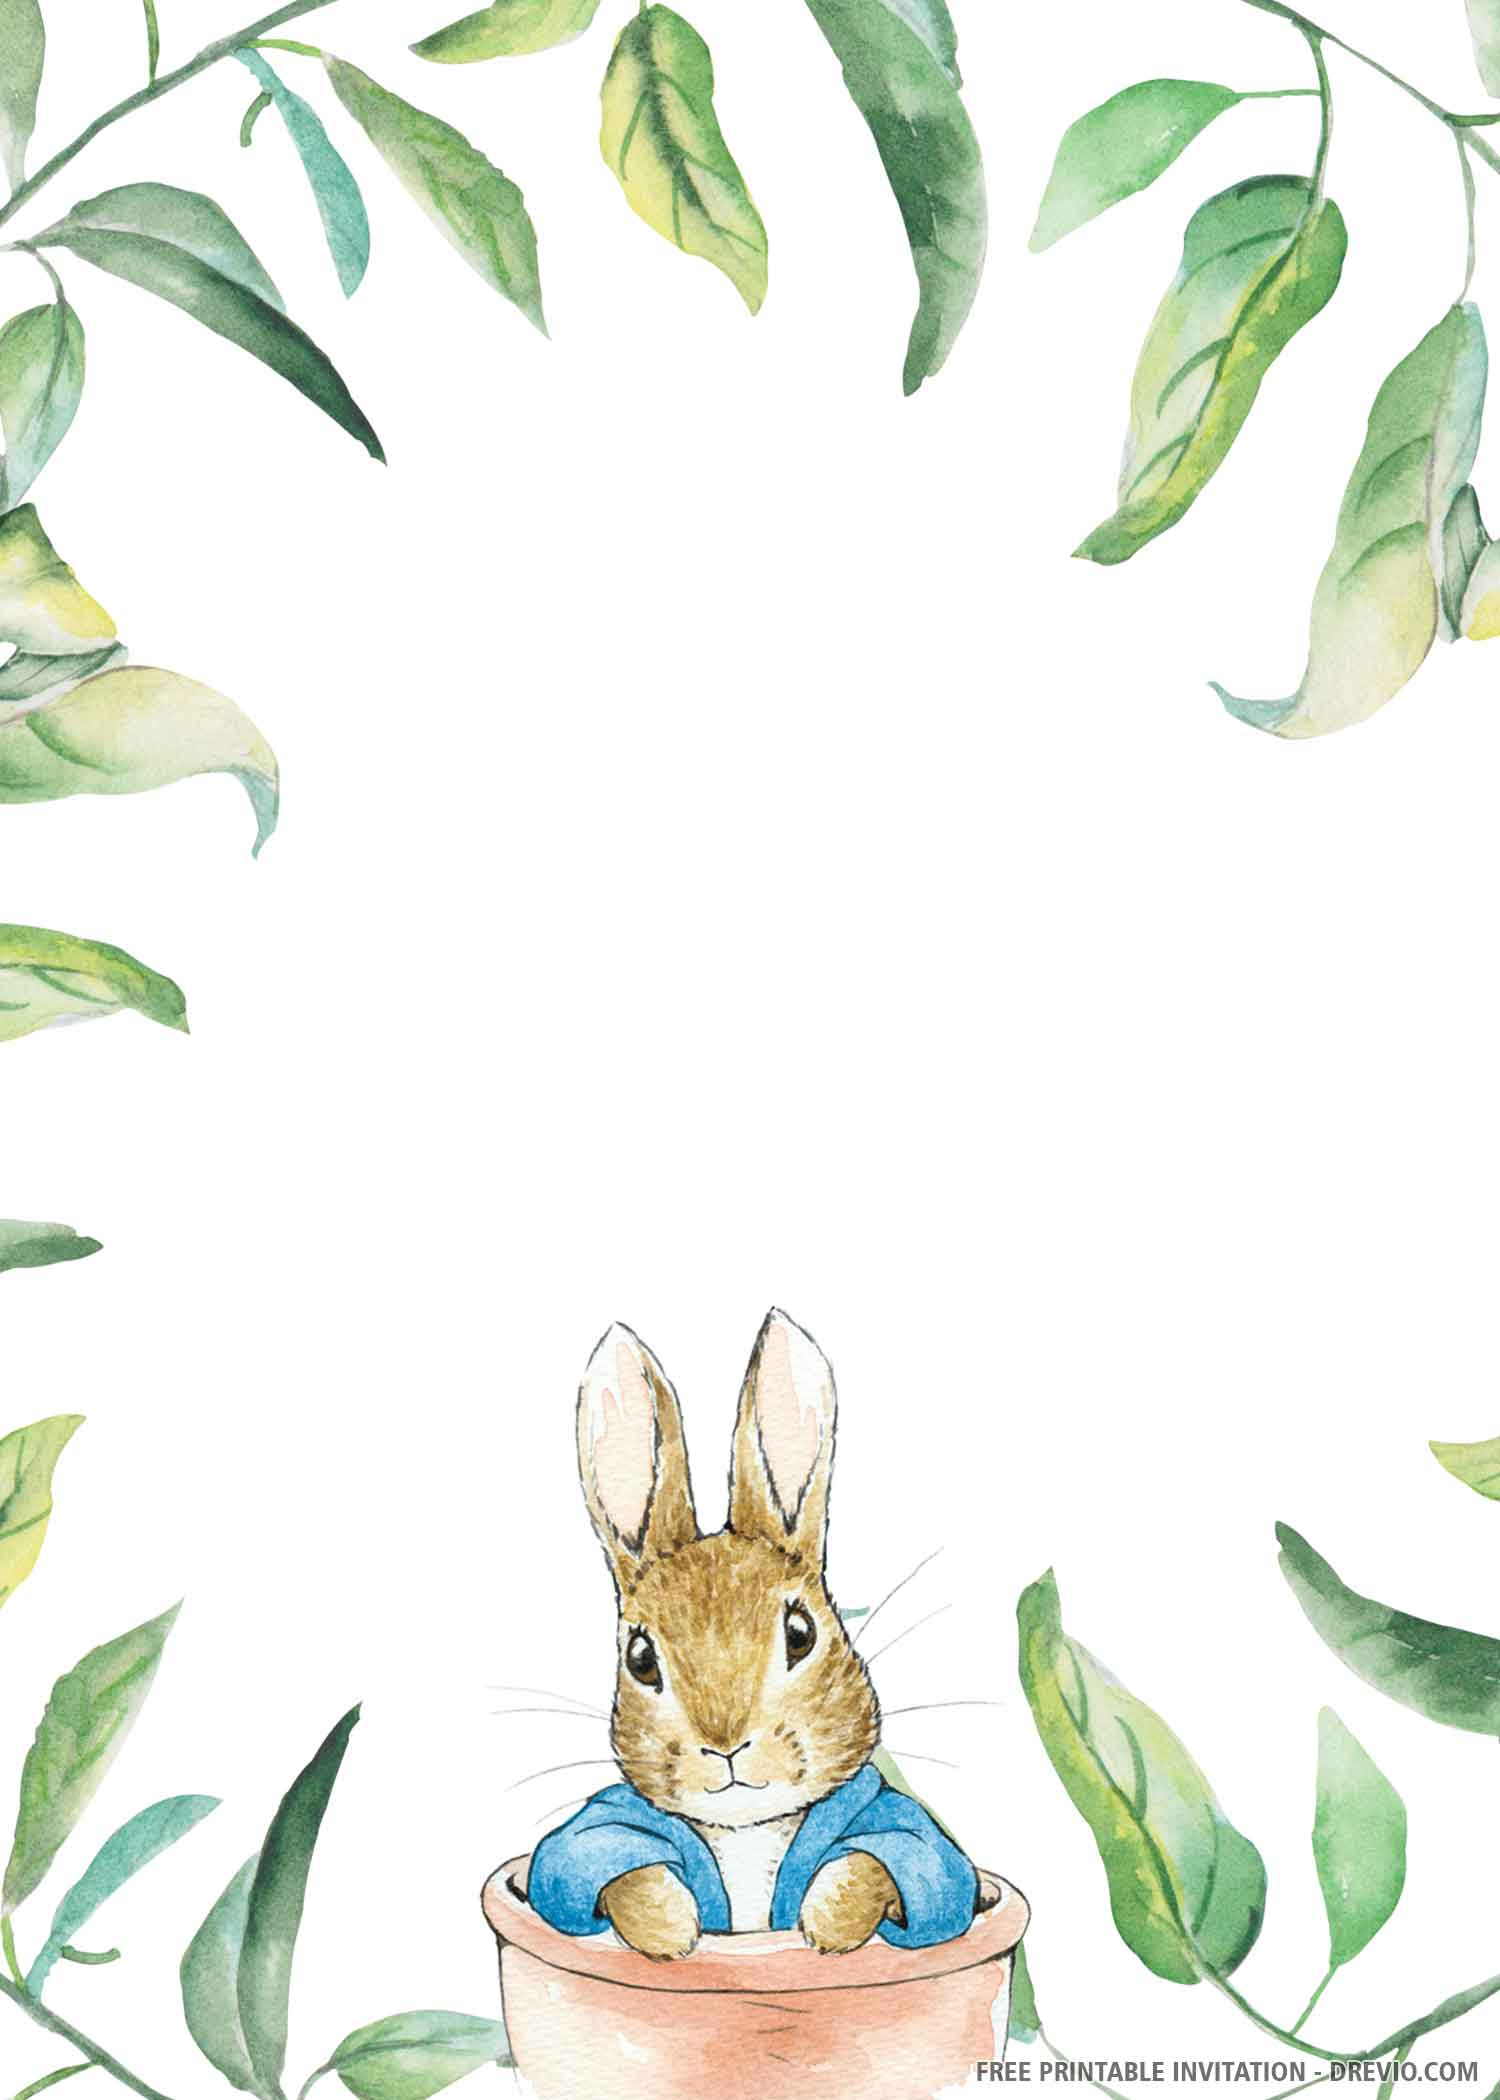 Free Printable Cute Bunny Birthday Invitation Template